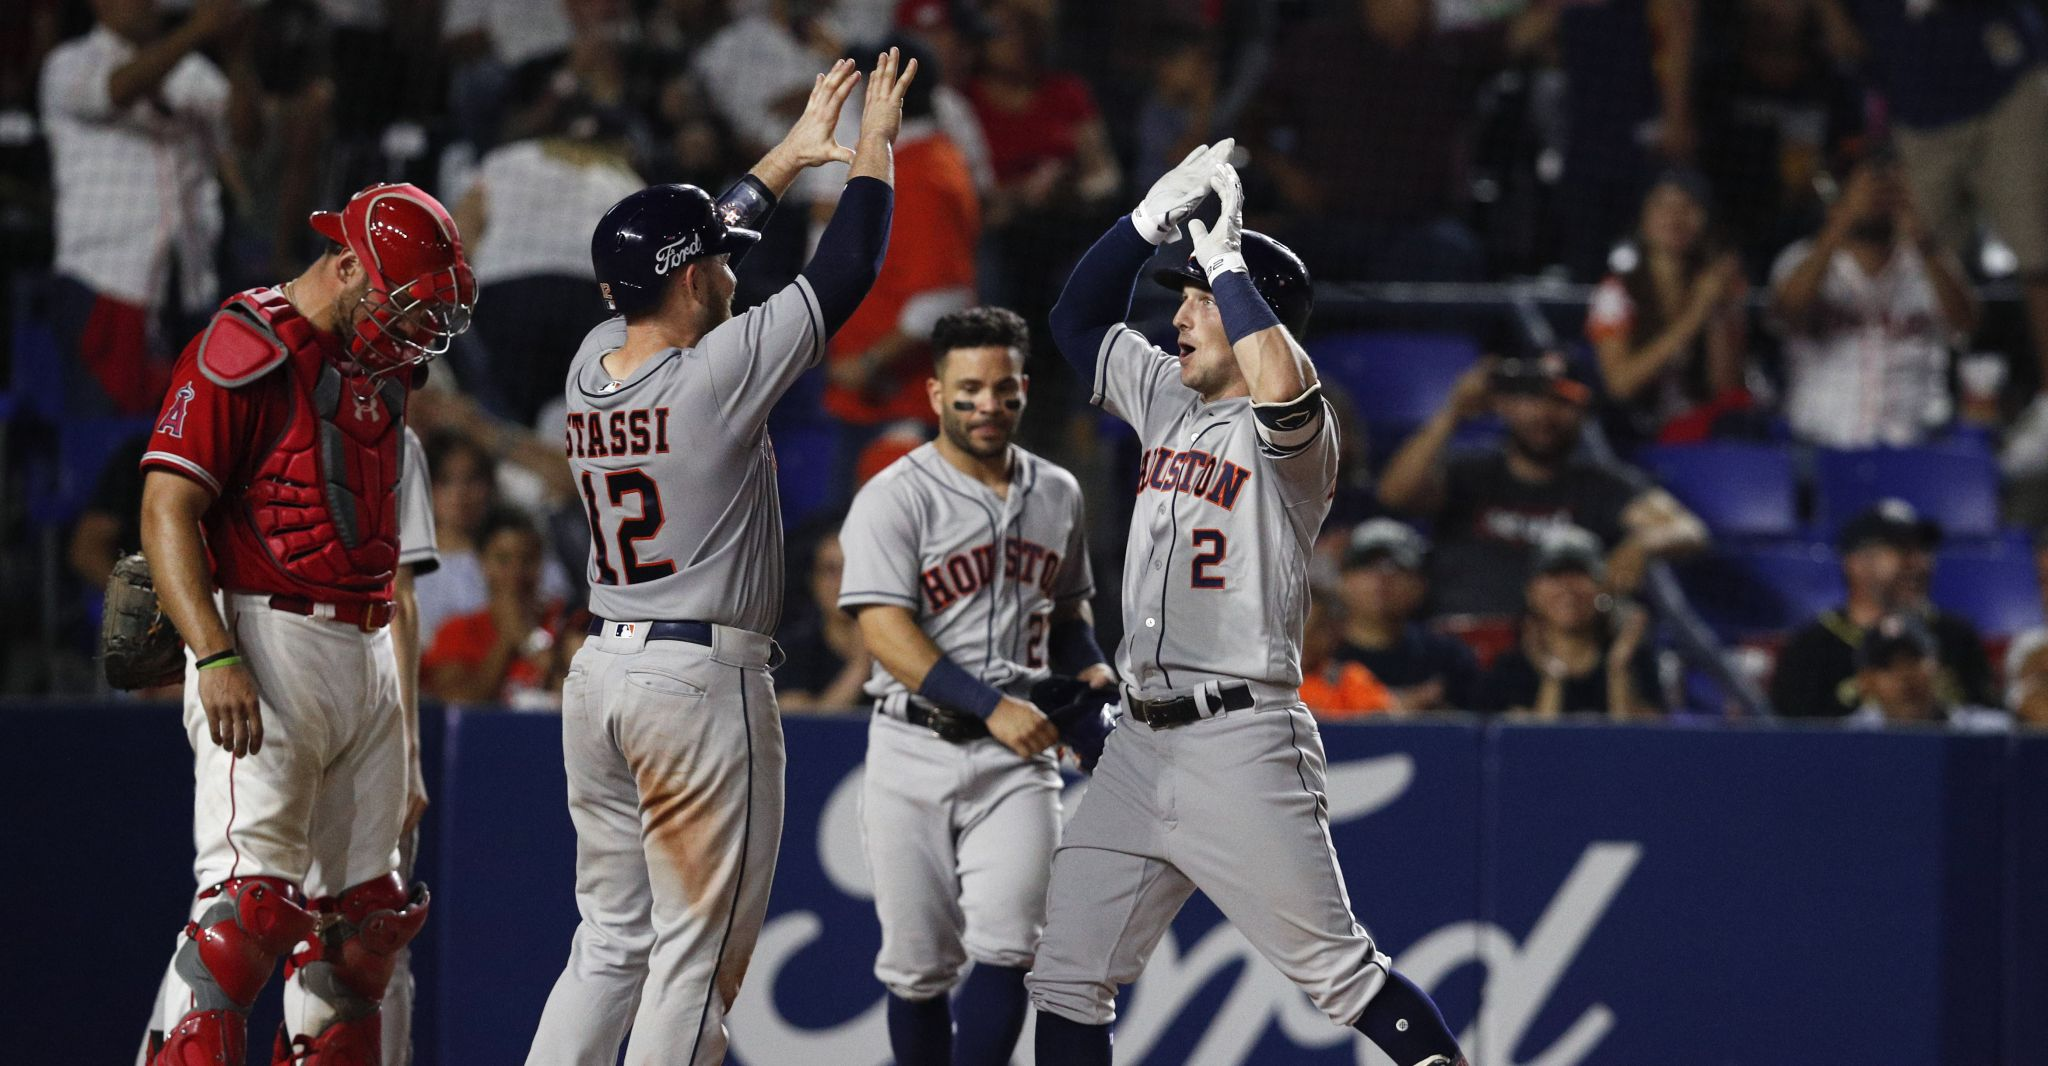 decd20637 Astros rout Angels to open Monterrey series – Health Breaking News